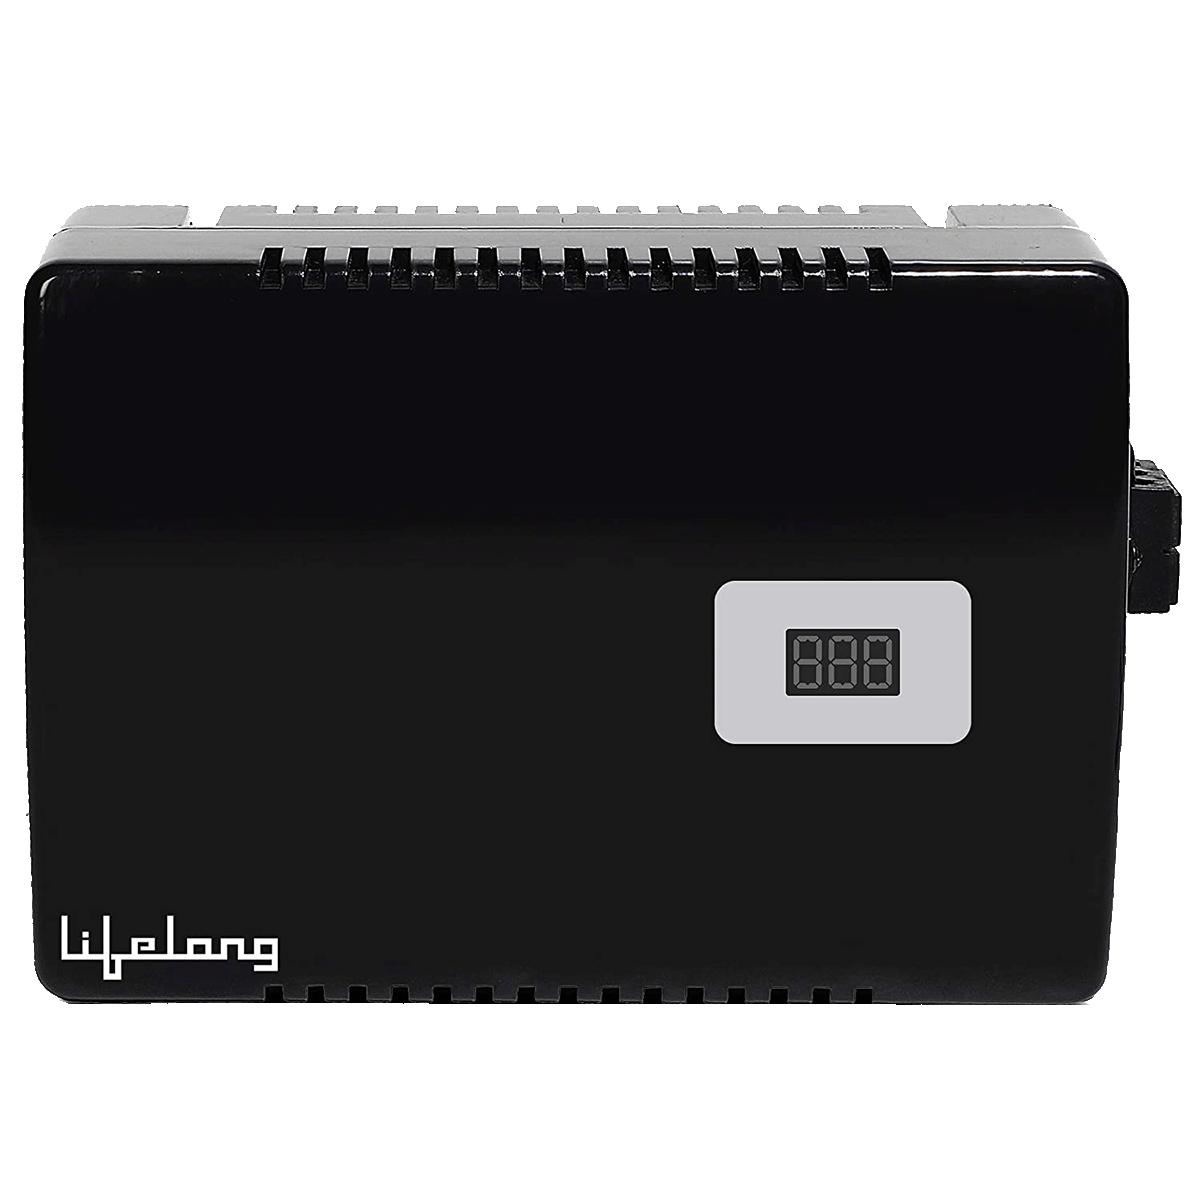 Lifelong 160-280V Air Conditioner Voltage Stabilizer for up to 1.5 Ton (LLVST400, Black)_1